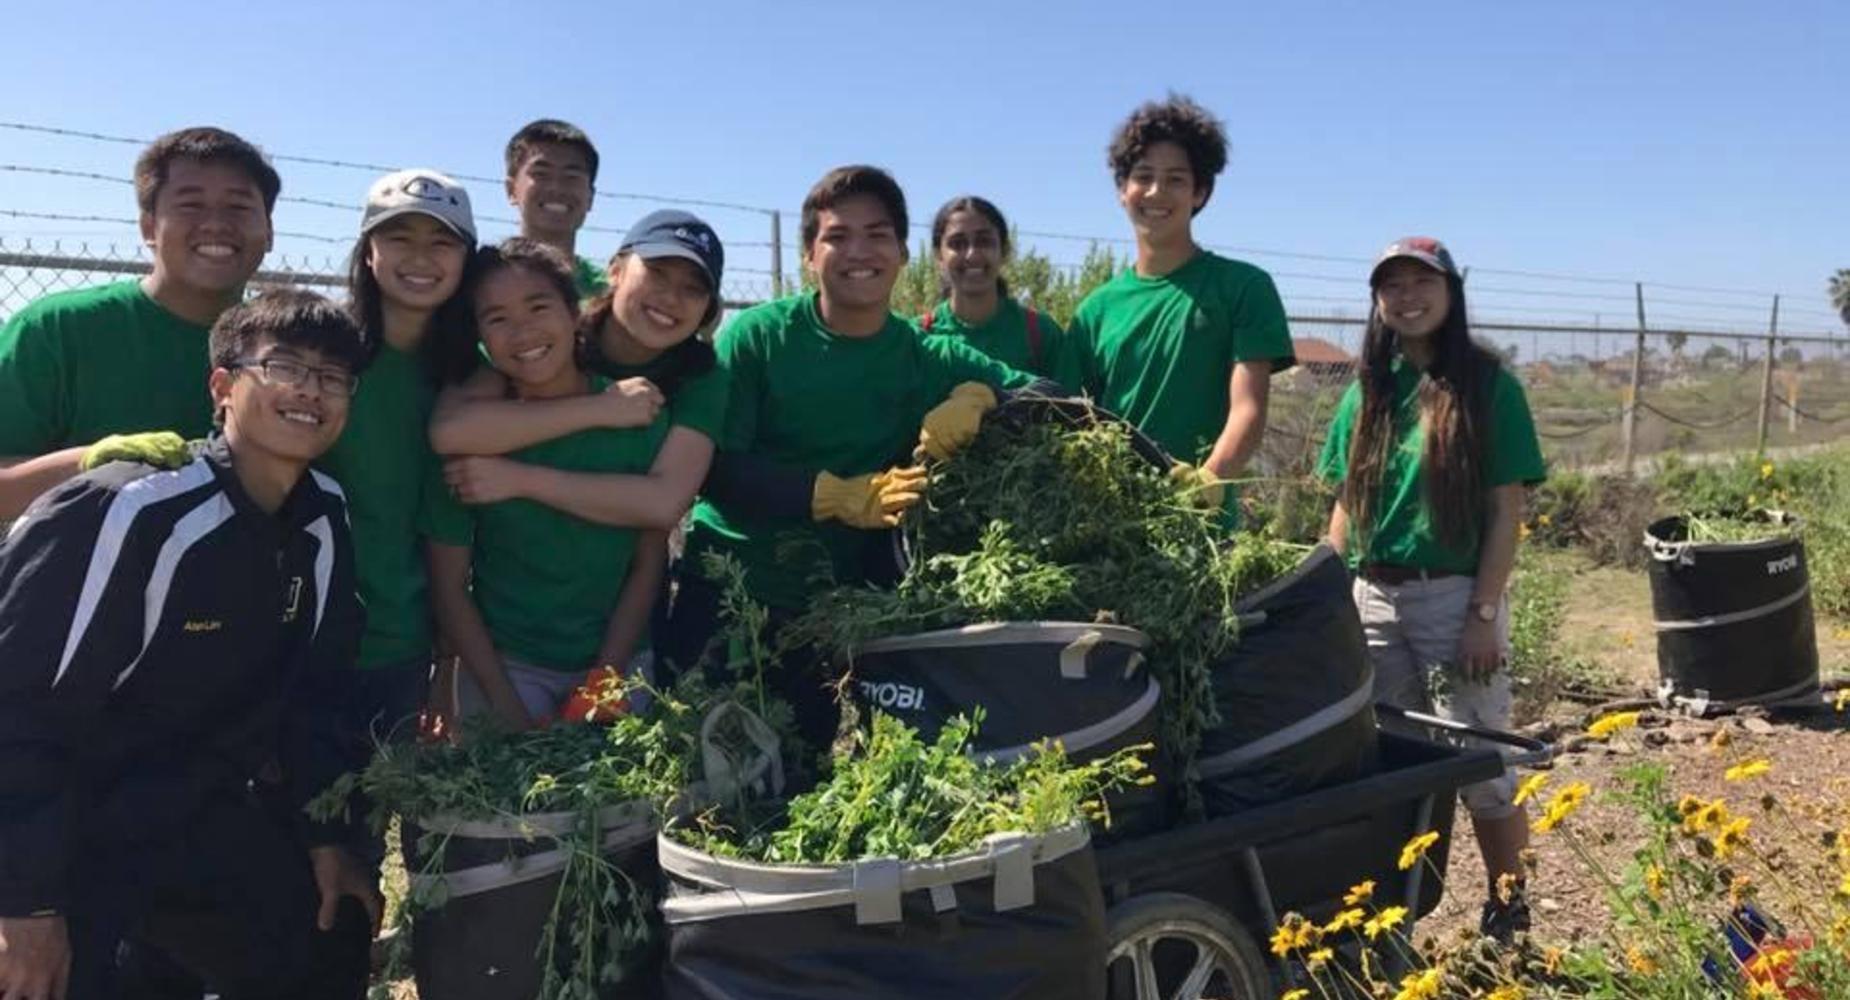 10 students gardening